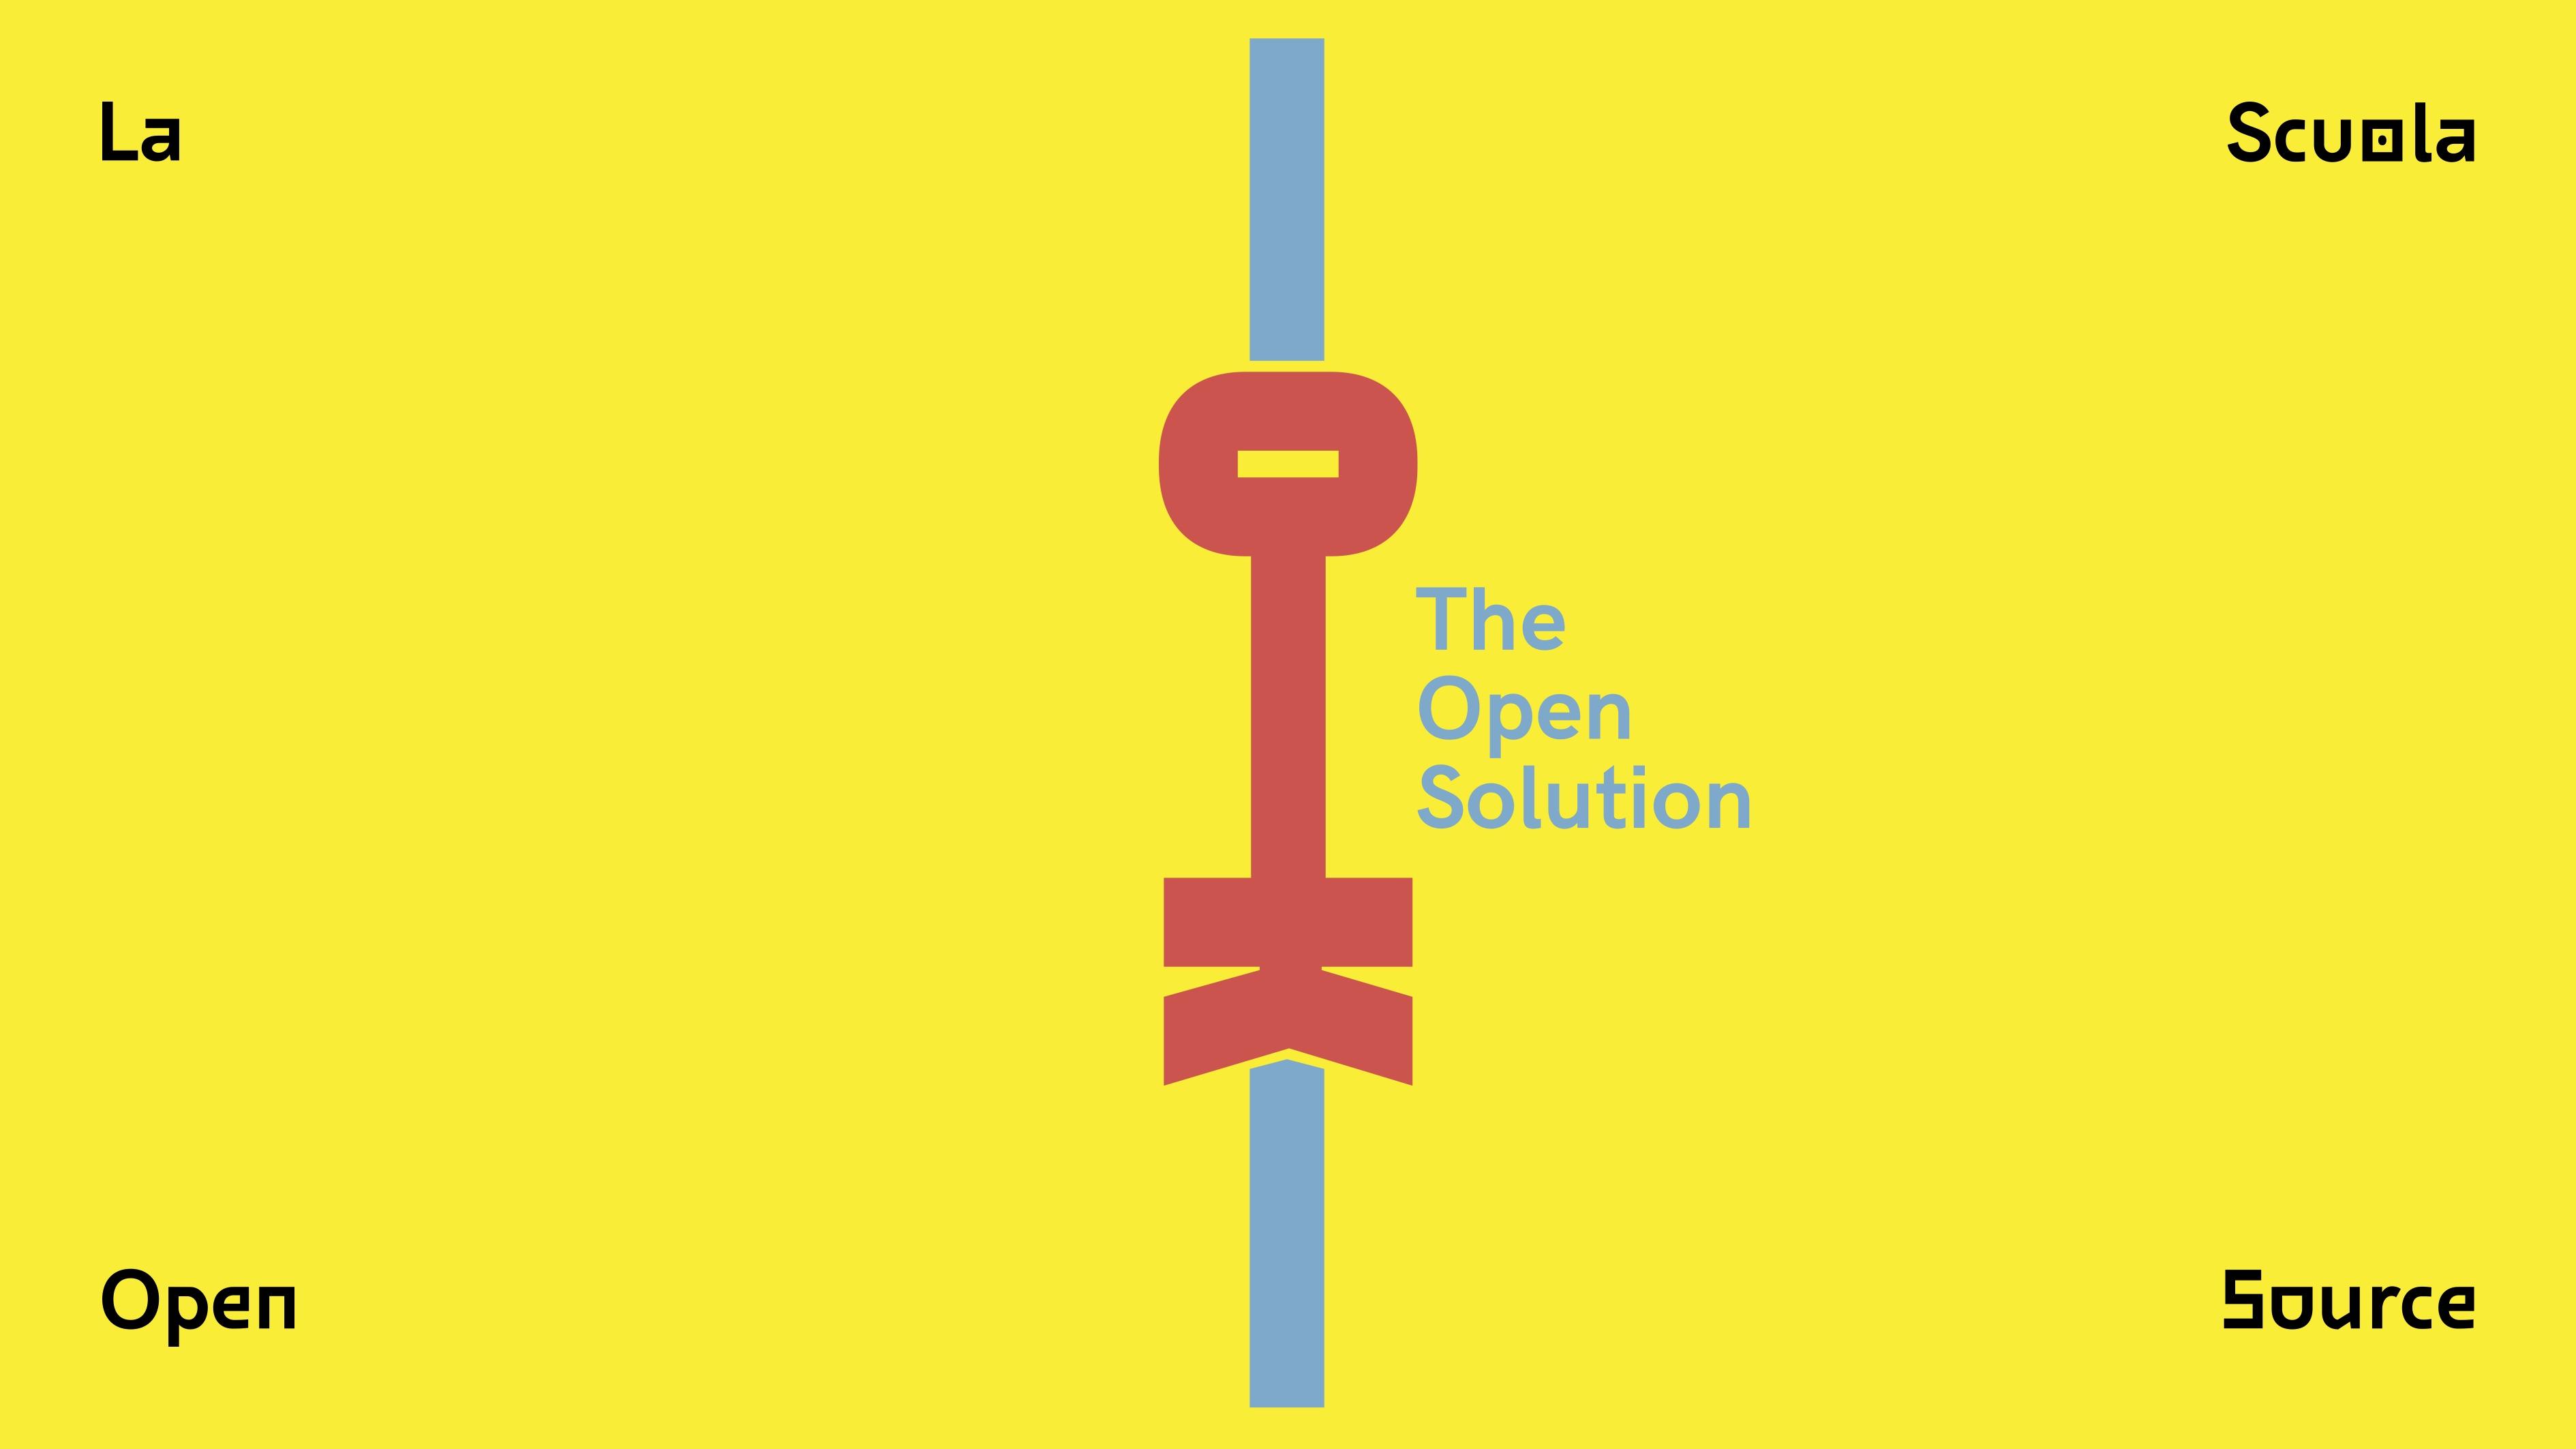 Ø-KEY: The Open Solution